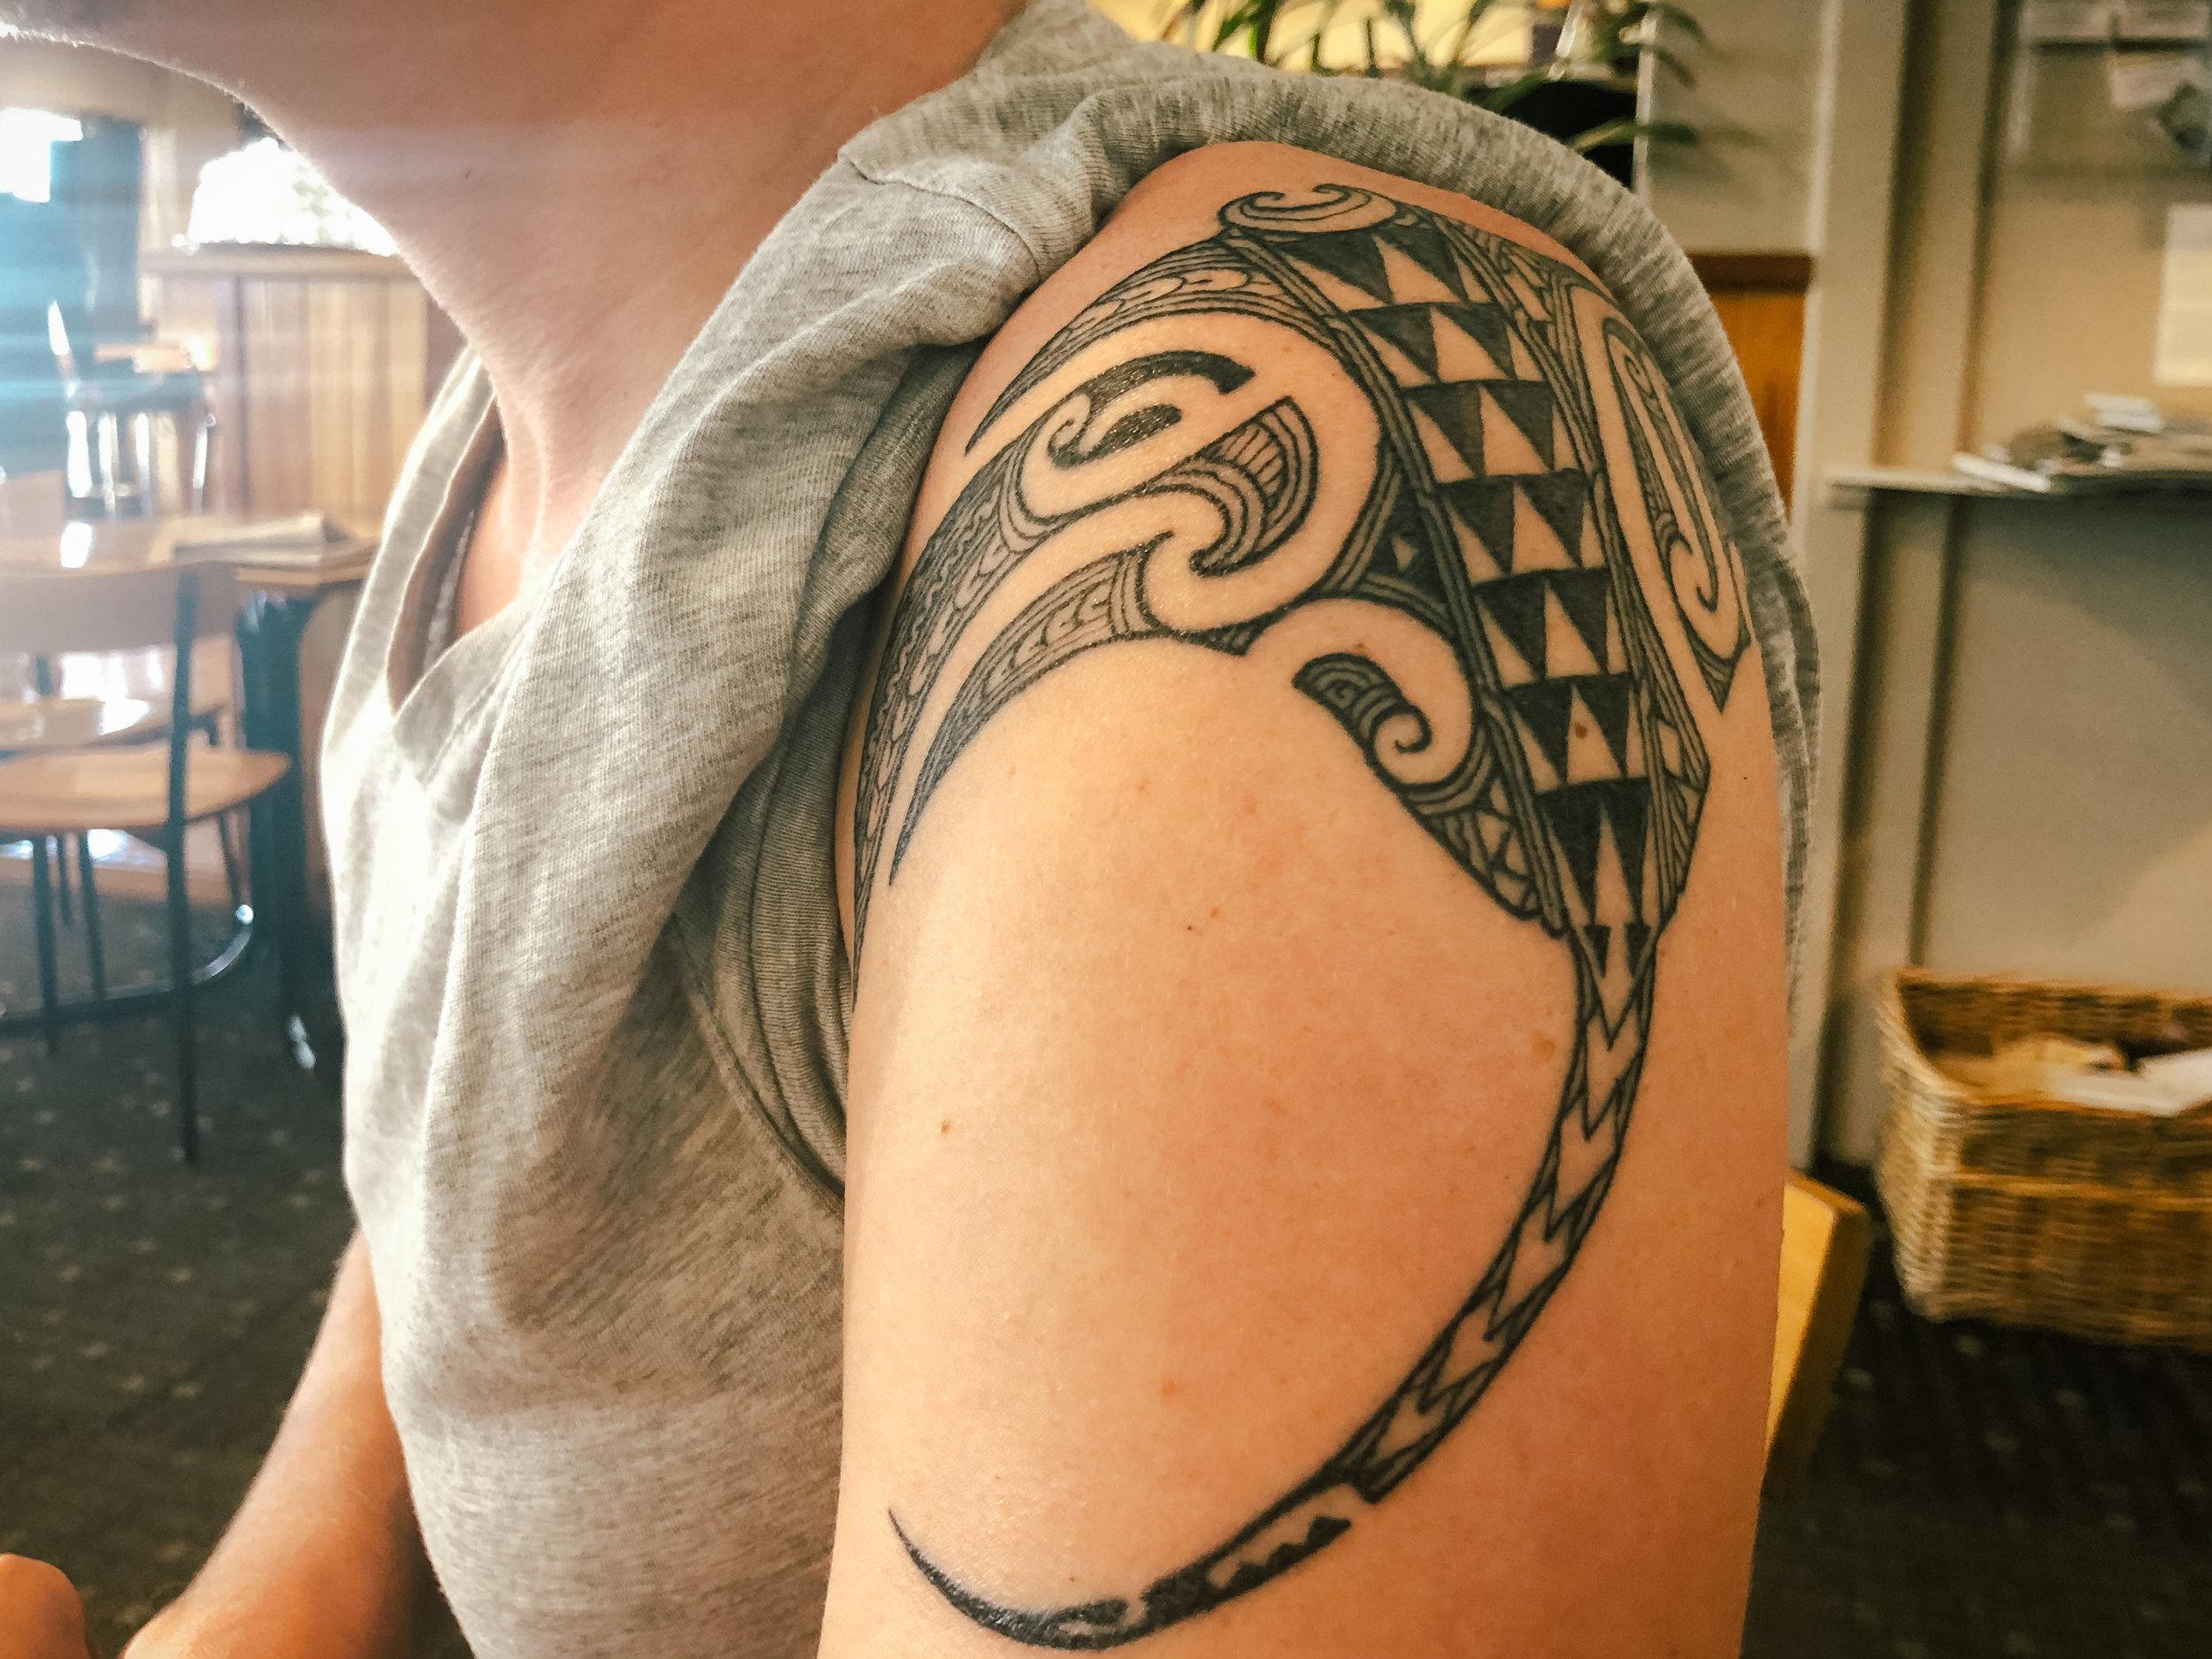 Tattoo in wellington